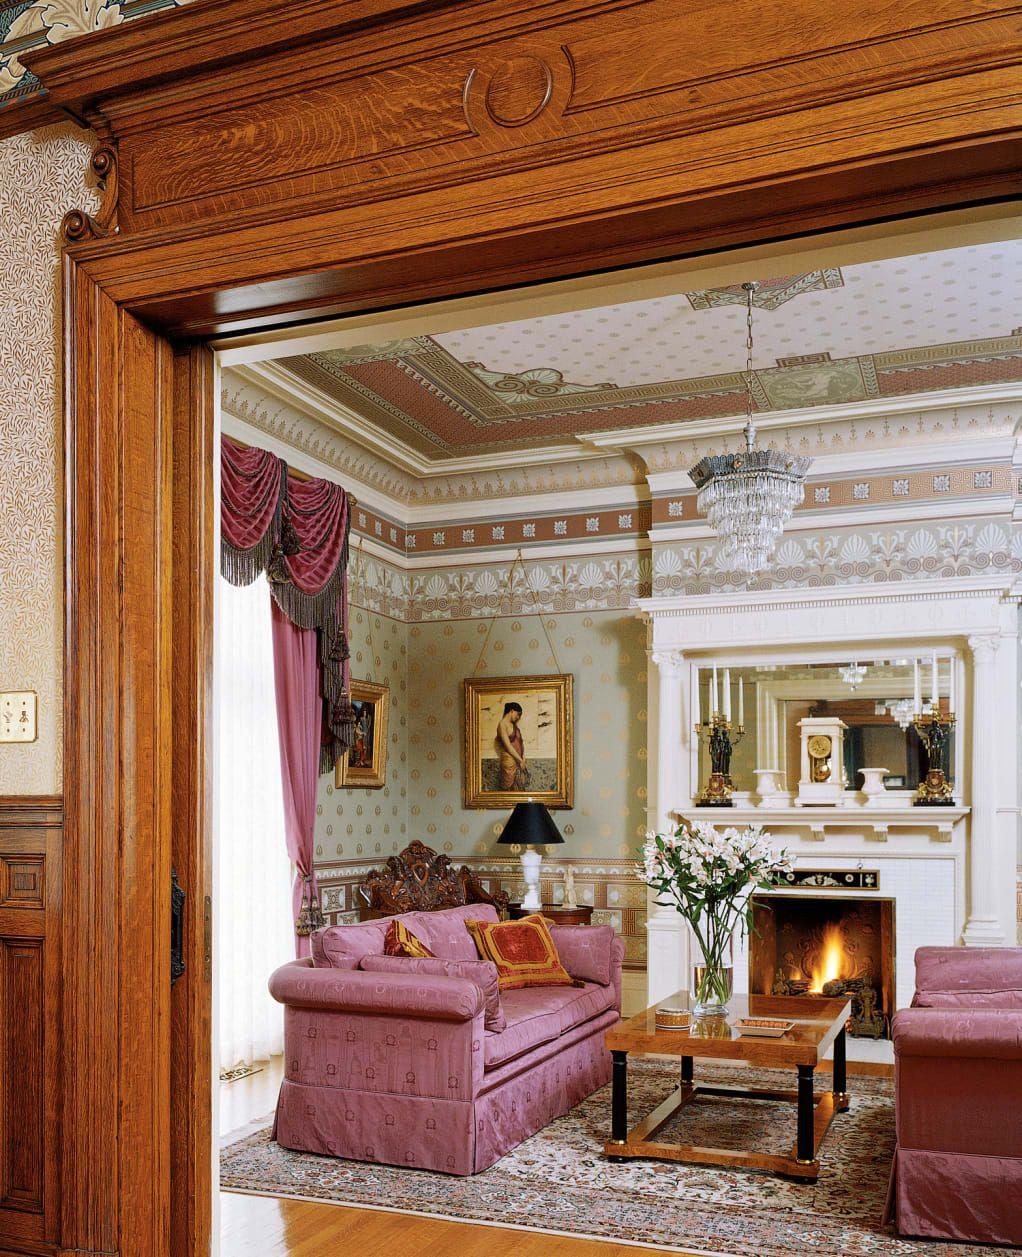 Renovating A Victorian Victorian Homes Victorian Style Homes Victorian Home Decor #old #victorian #living #room